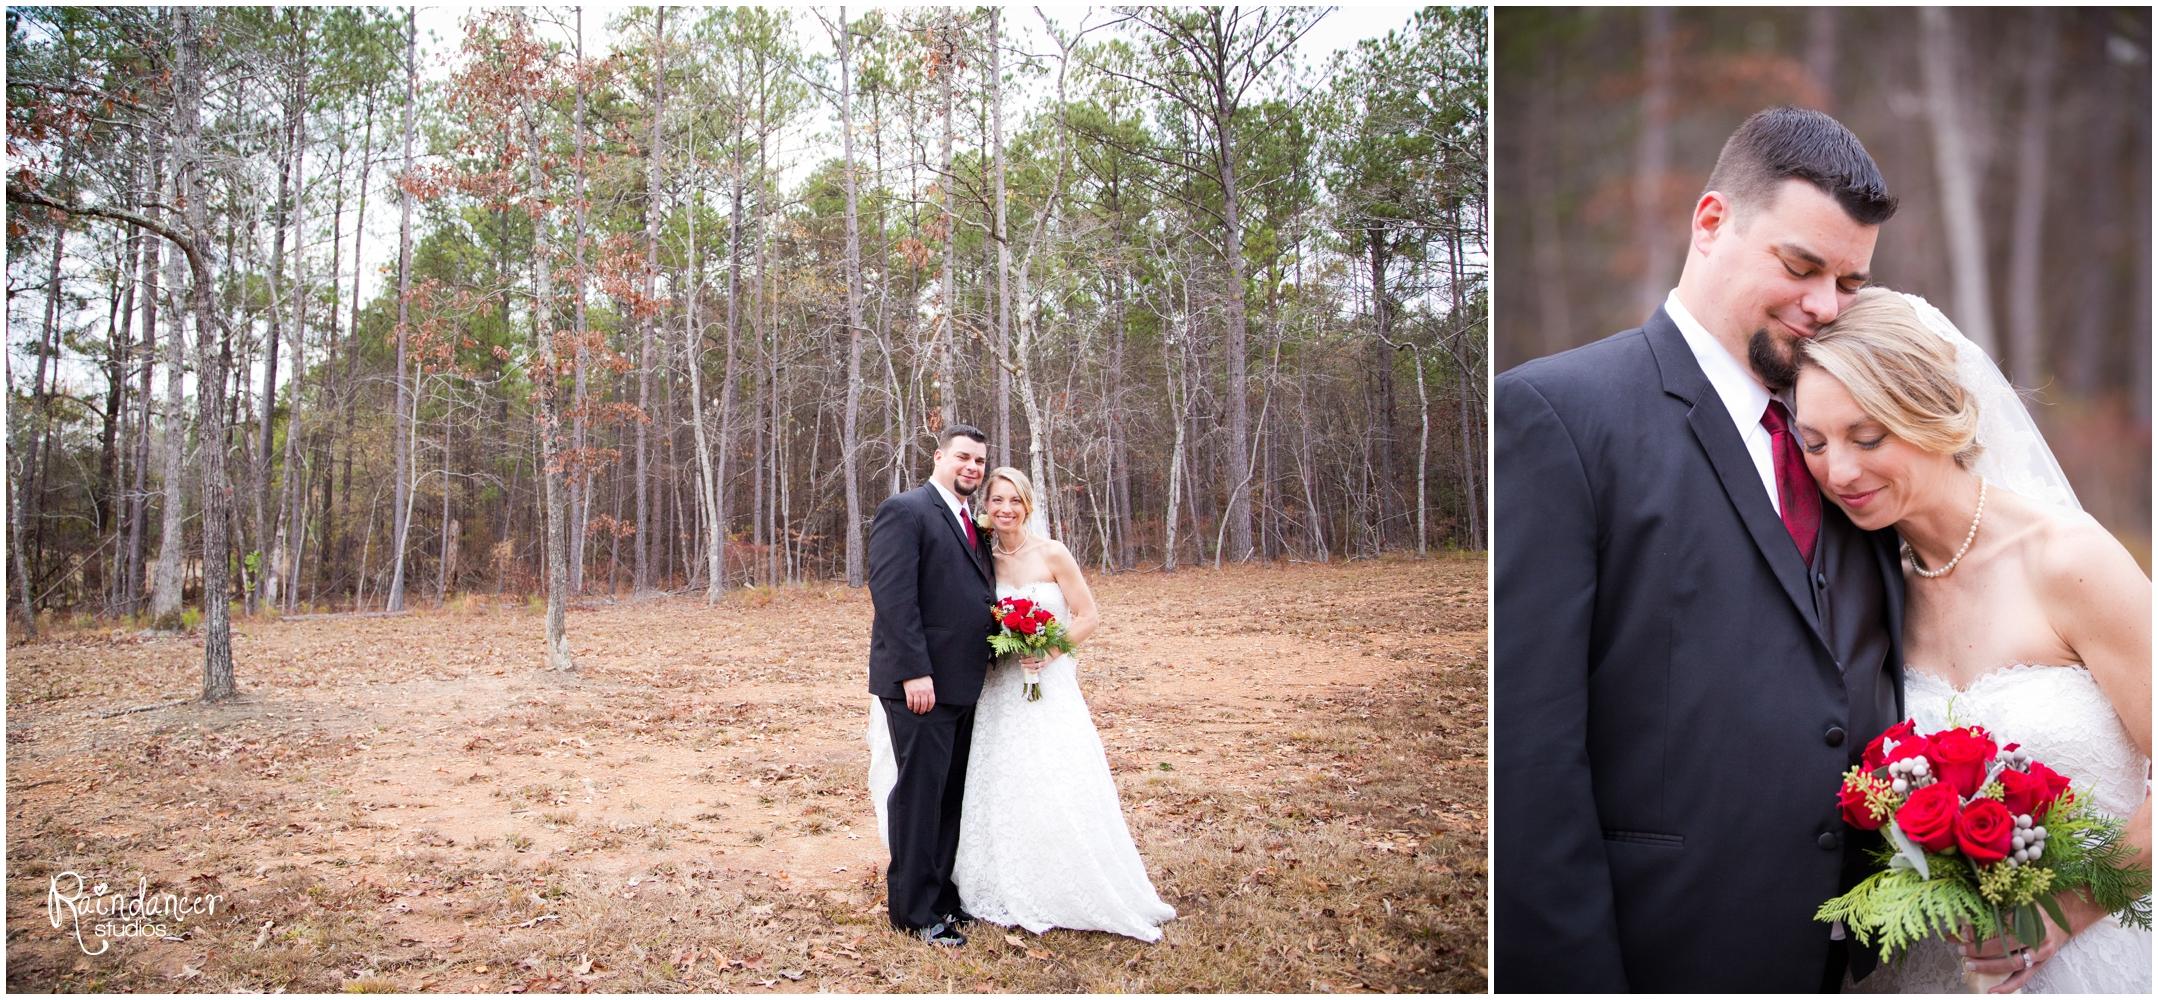 Indianapolis wedding photographer, Indianapolis wedding photography, Indy wedding photographer, Indy wedding photography, Travel wedding photographer, travel wedding photography, Alabama Wedding